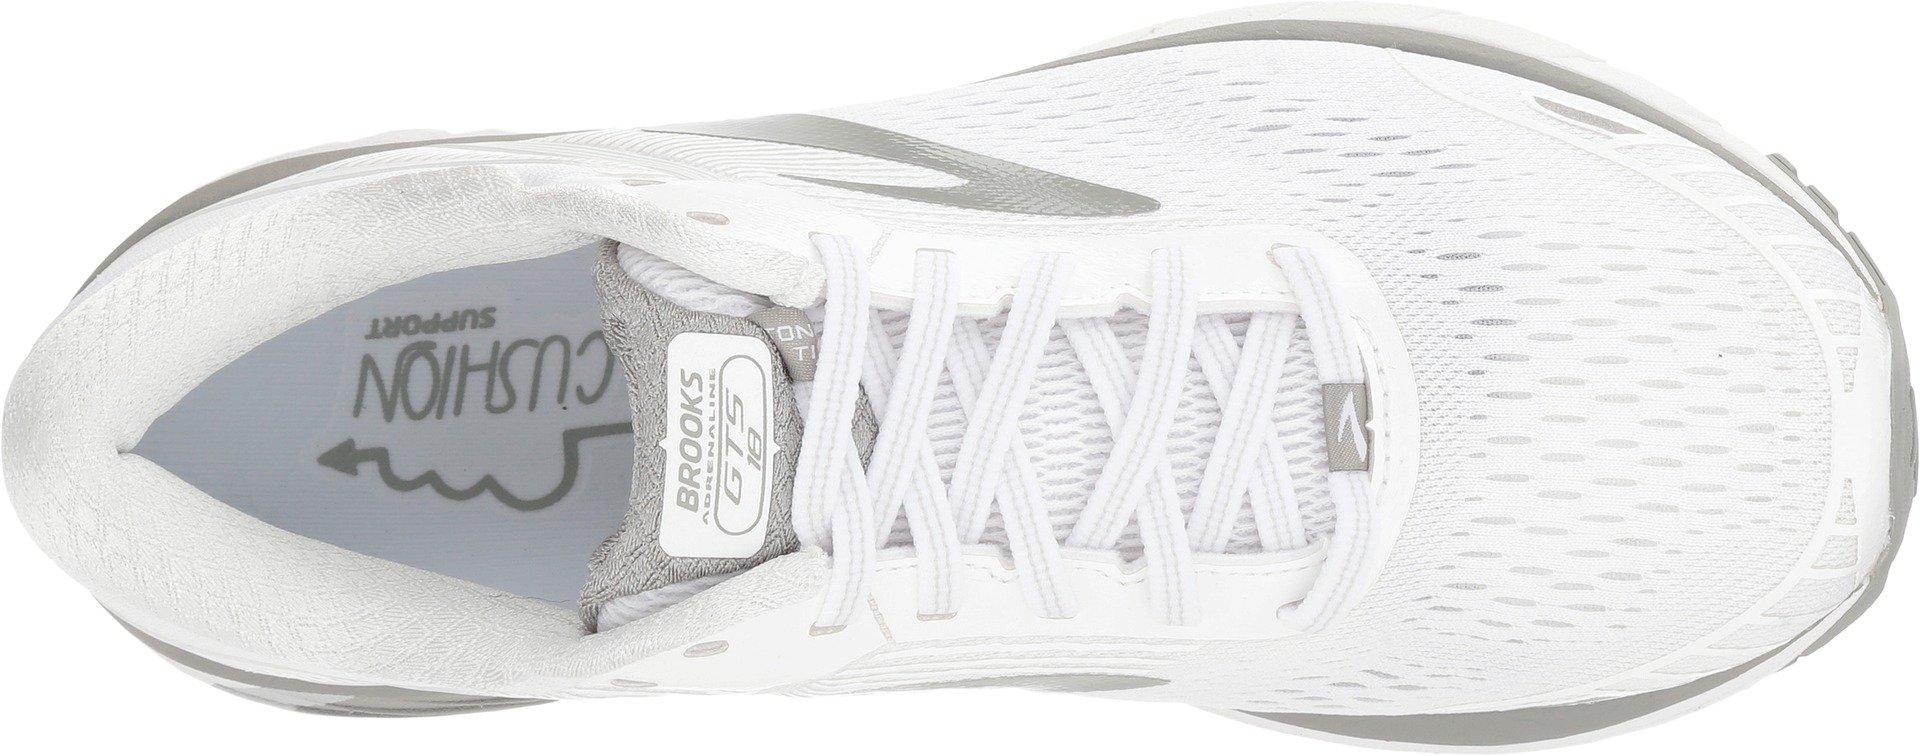 Brooks Women's Adrenaline GTS 18 White/White/Grey 5 D US by Brooks (Image #2)